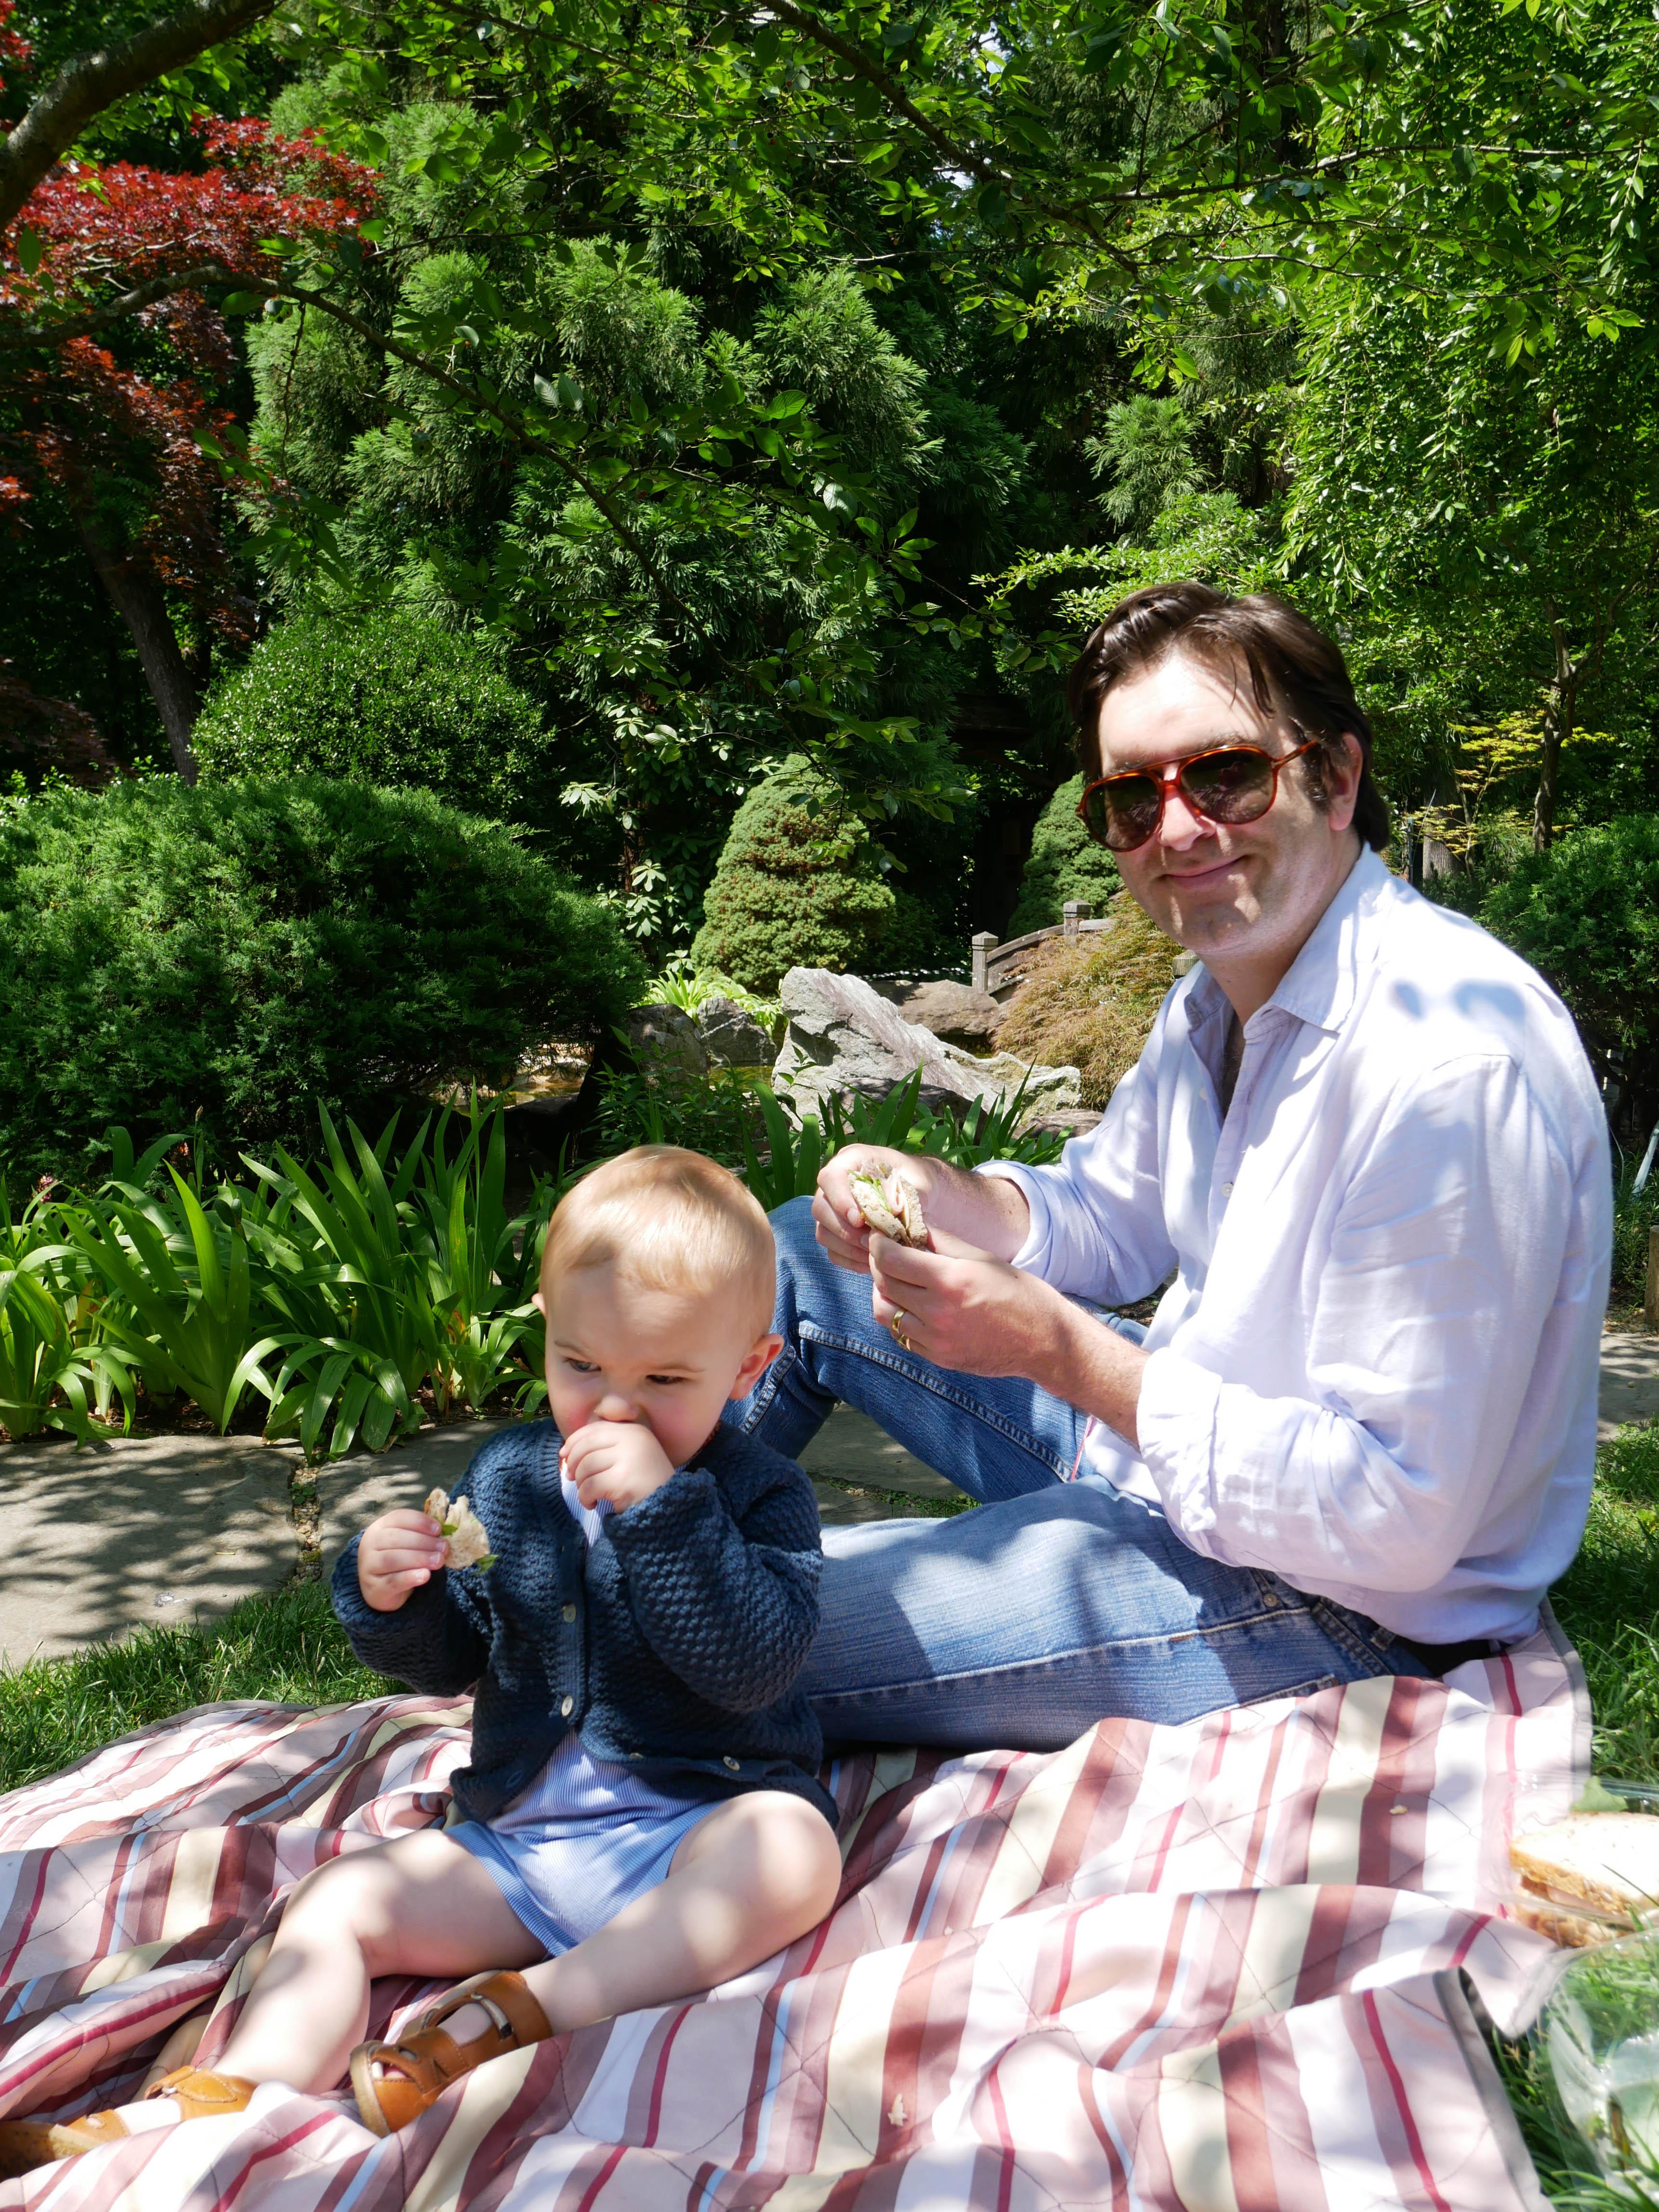 Hillwood picnic